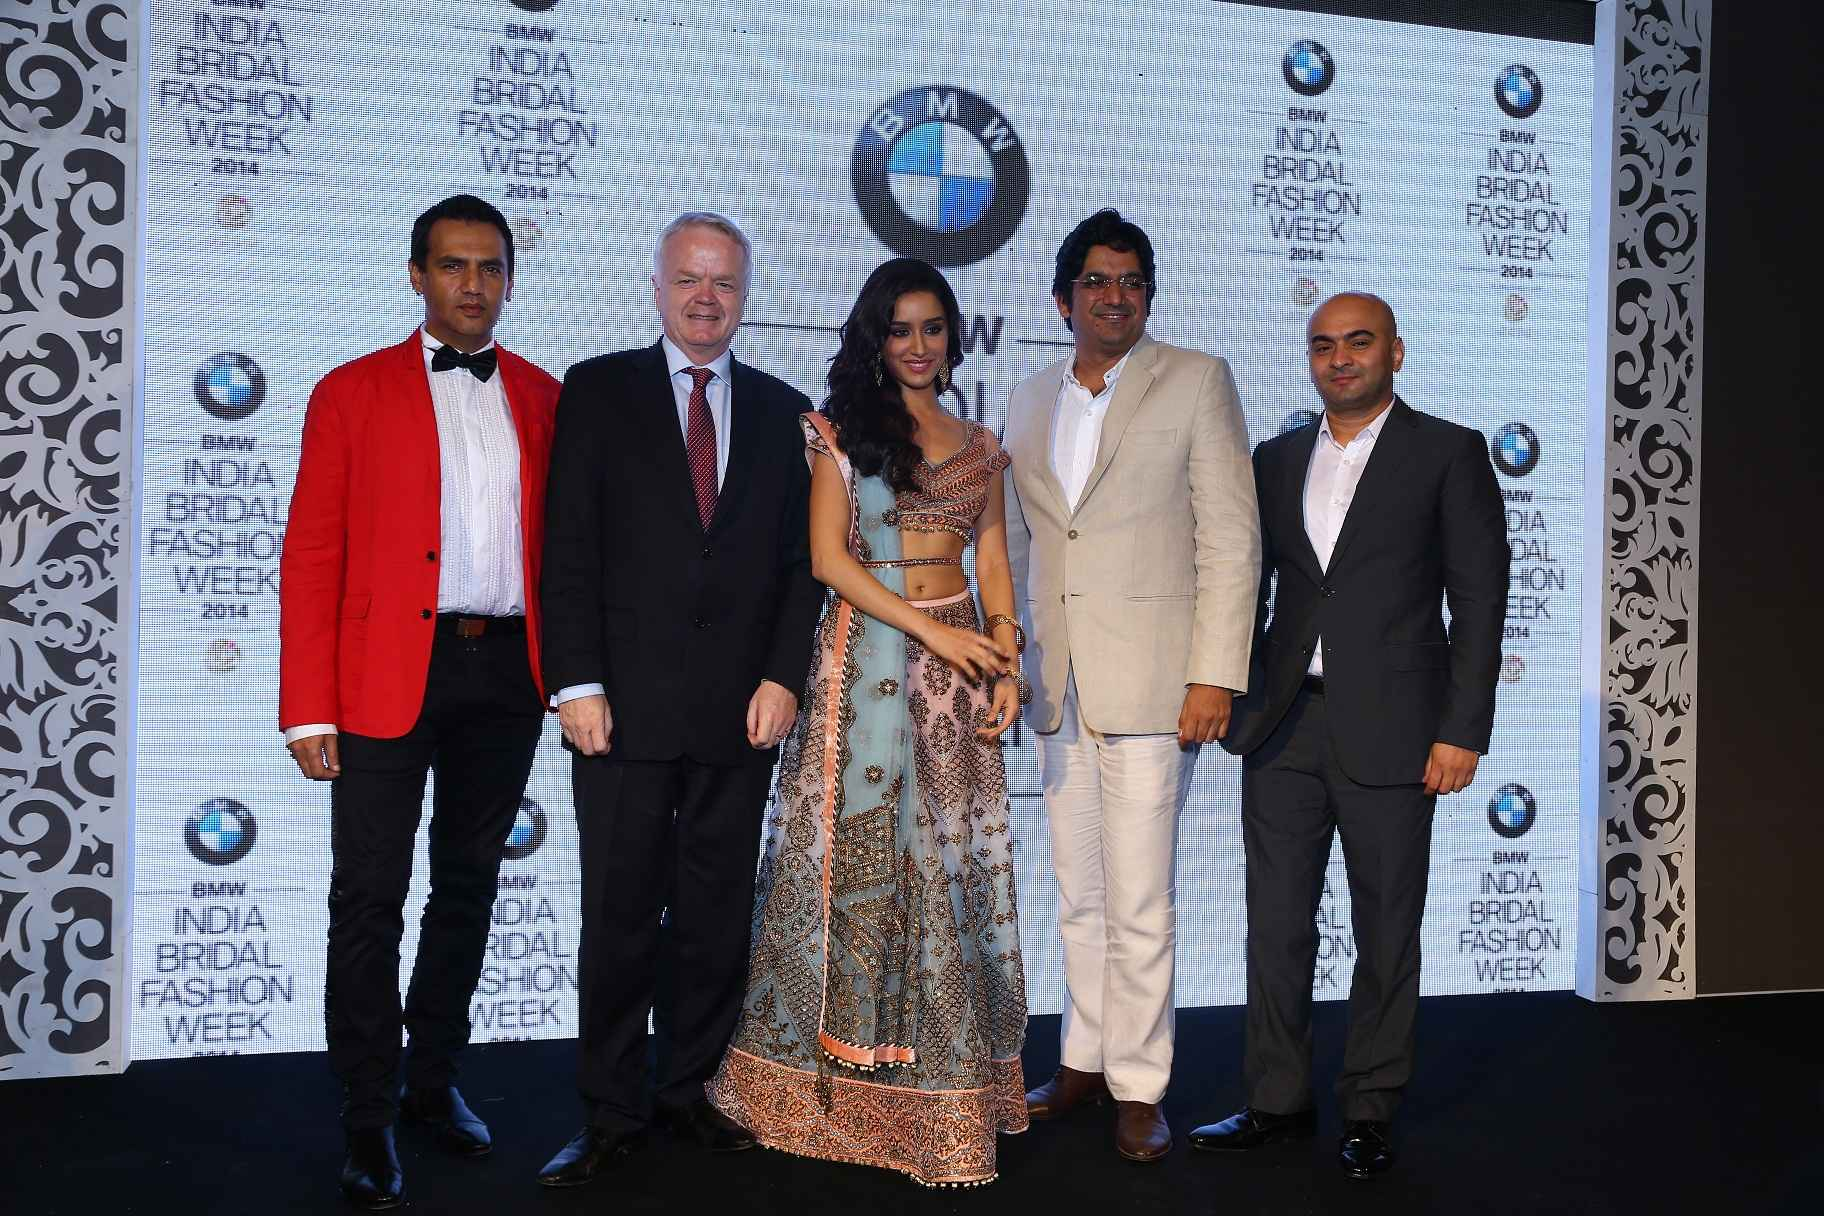 Marc Robinson, Philipp Von Sahr, President BMW Group, Shraddha Kapoor, Vipin Sharma,Director Jewellery World Gold Council, Vijay Singh Founder Fashion One Int seen at the press con of BMW IBFW in association with AZVA